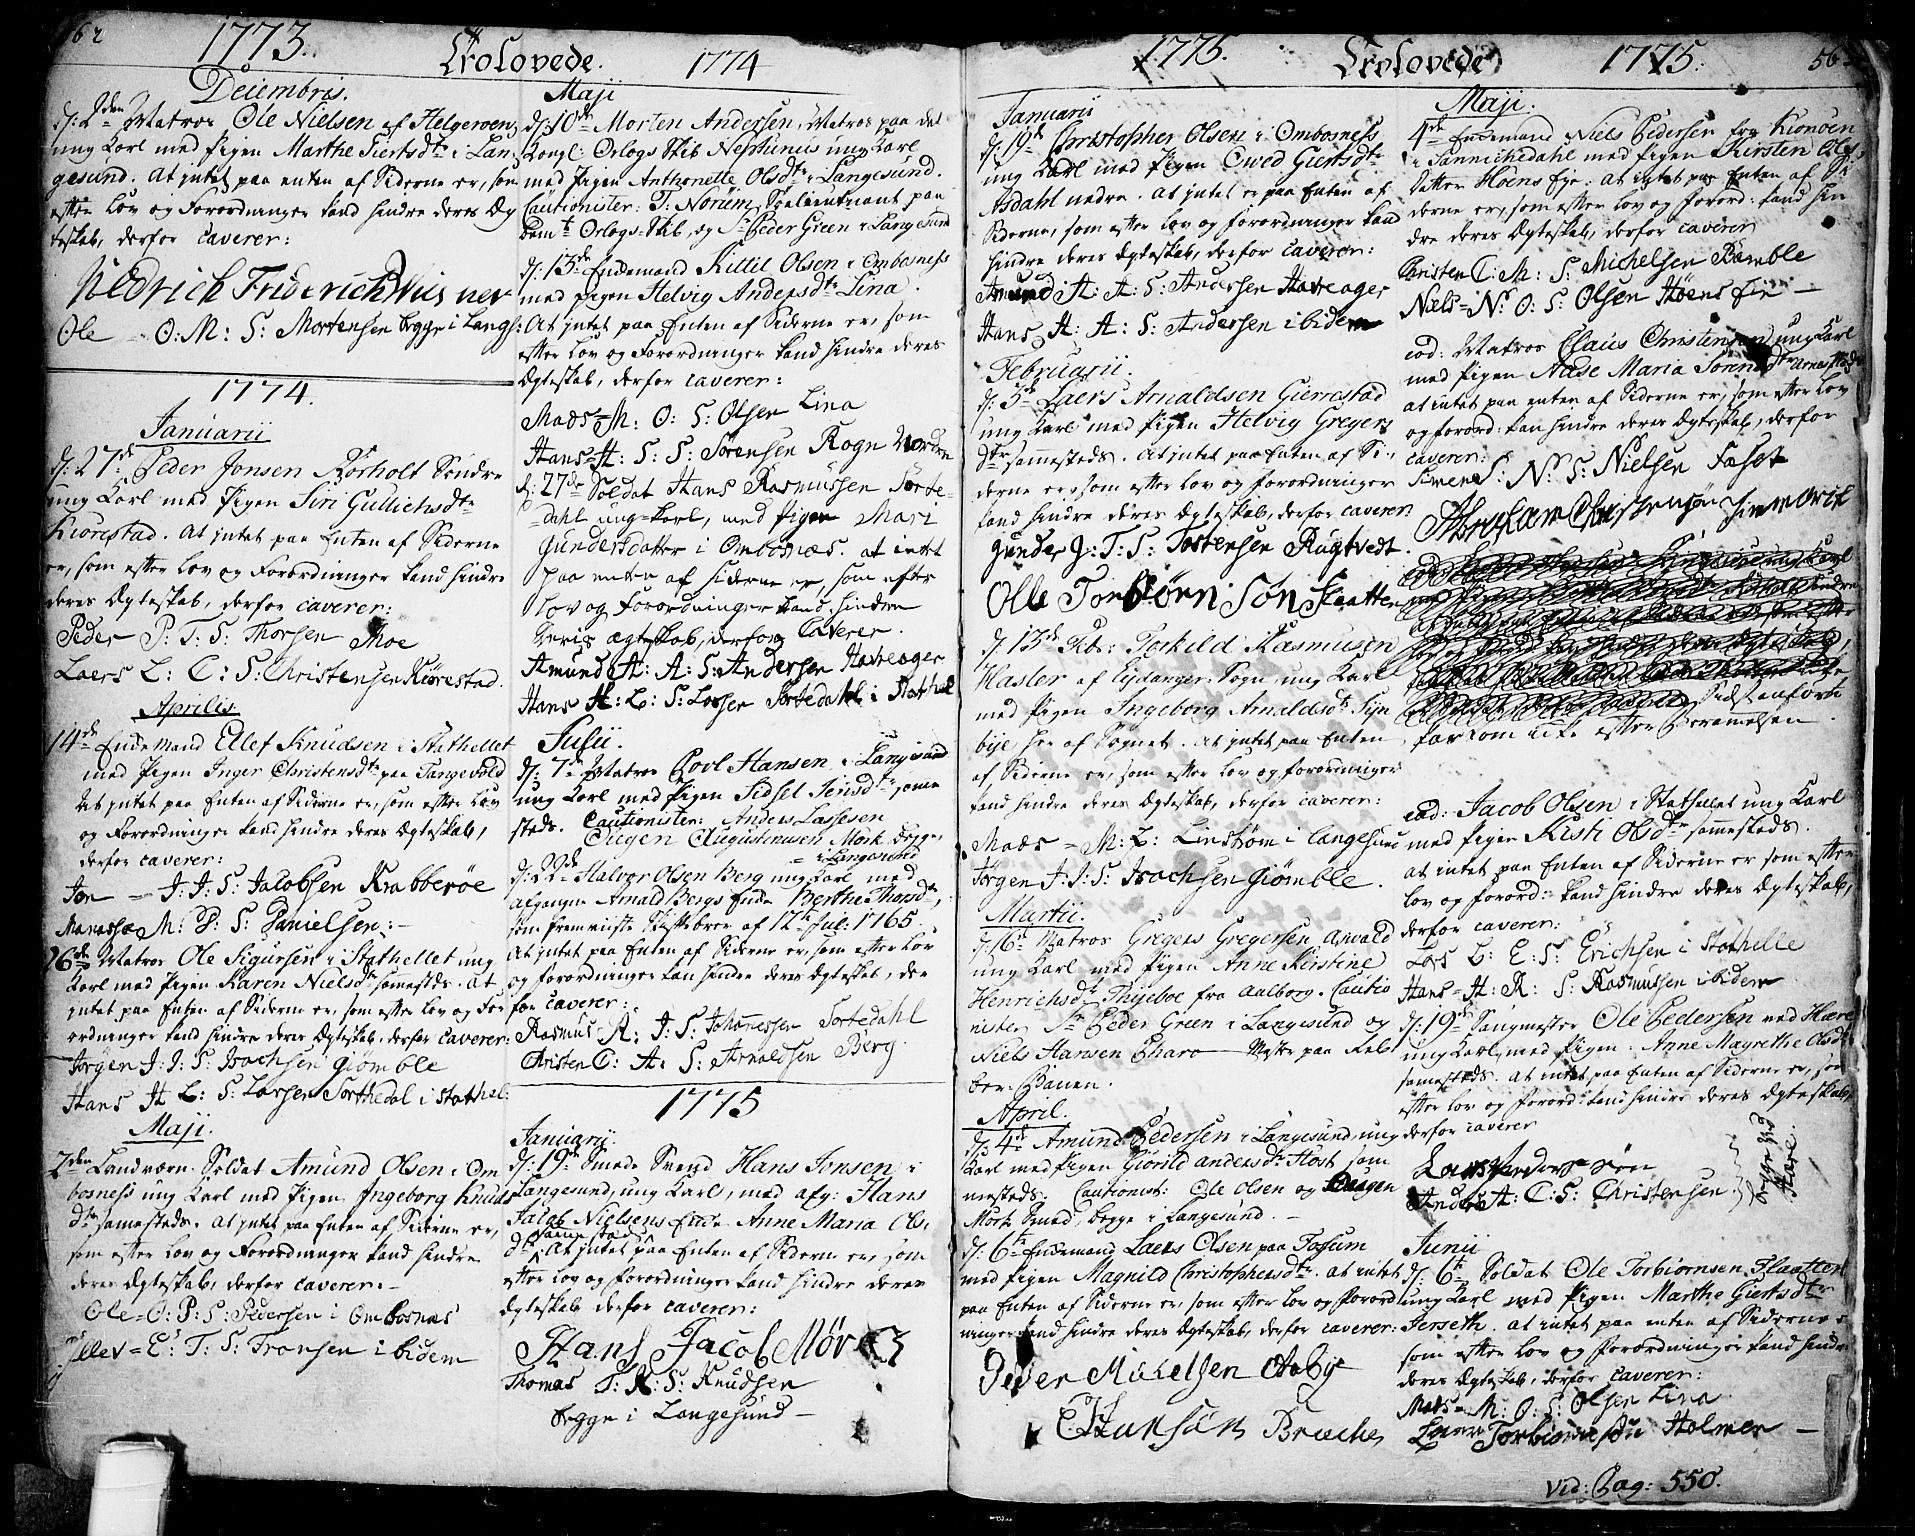 SAKO, Bamble kirkebøker, F/Fa/L0001: Ministerialbok nr. I 1, 1702-1774, s. 562-563